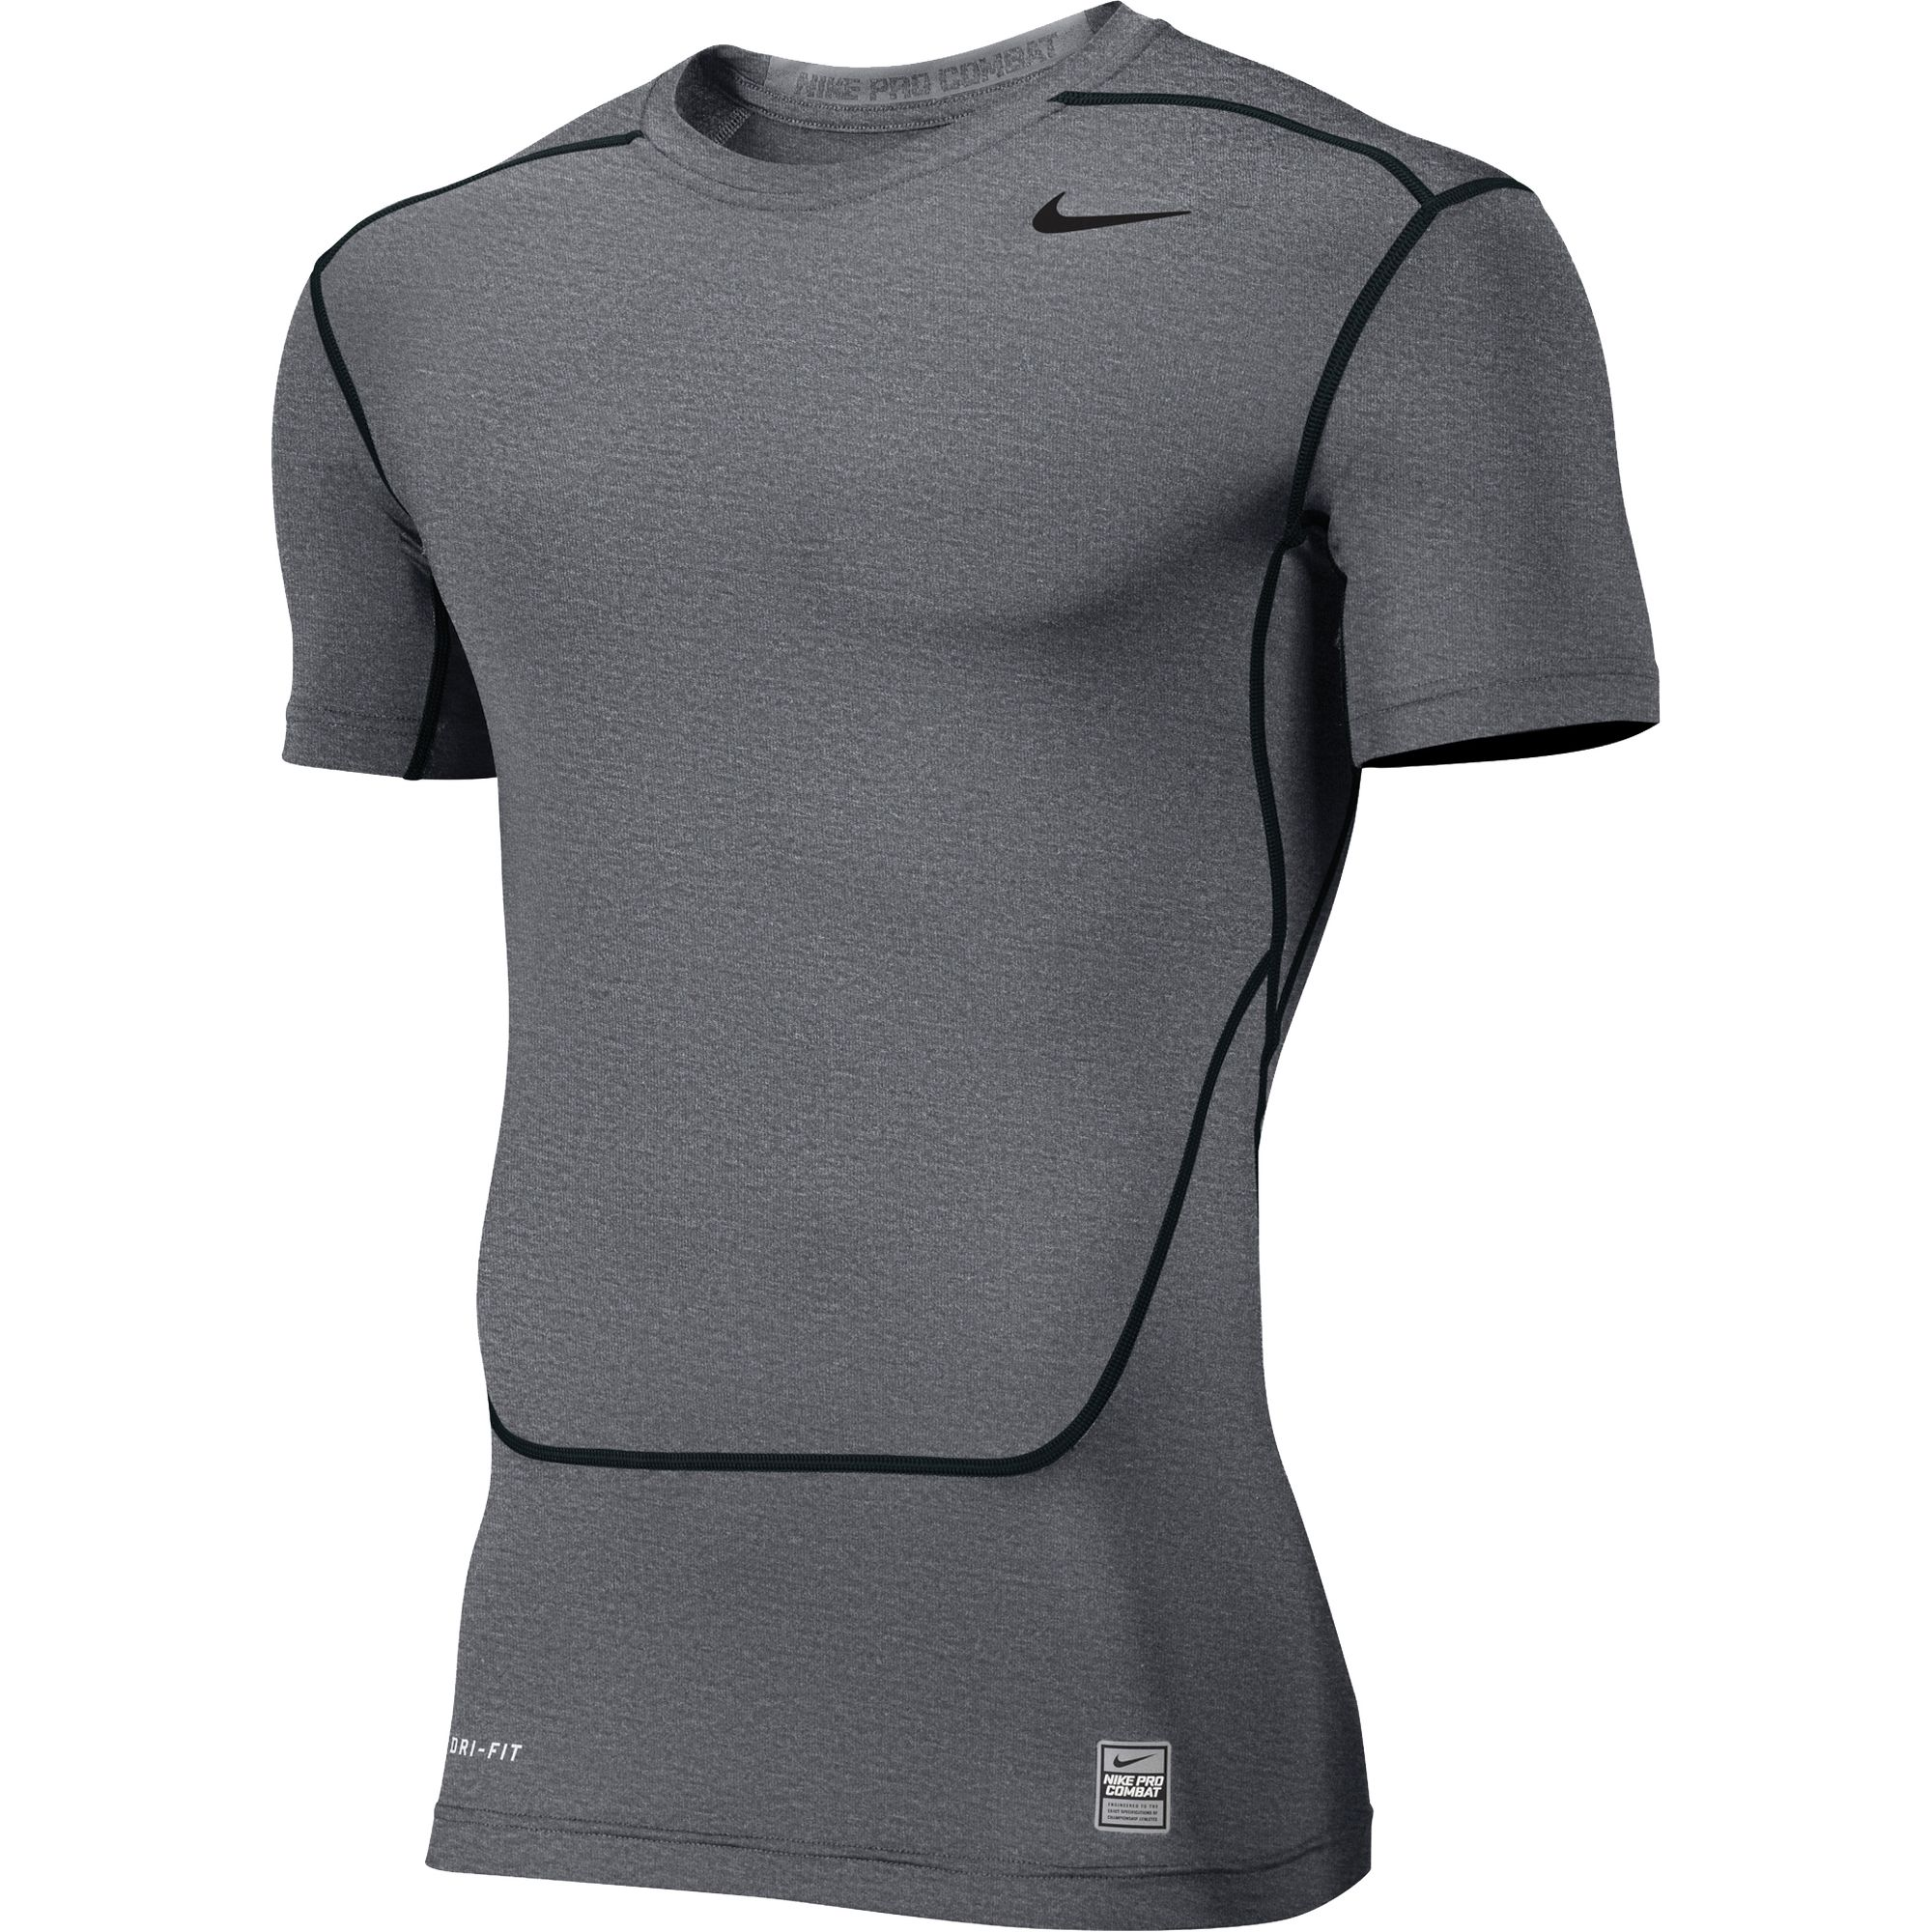 Nike men 39 s dri fit pro combat base layer training shirt ebay for Under armour dri fit long sleeve shirts